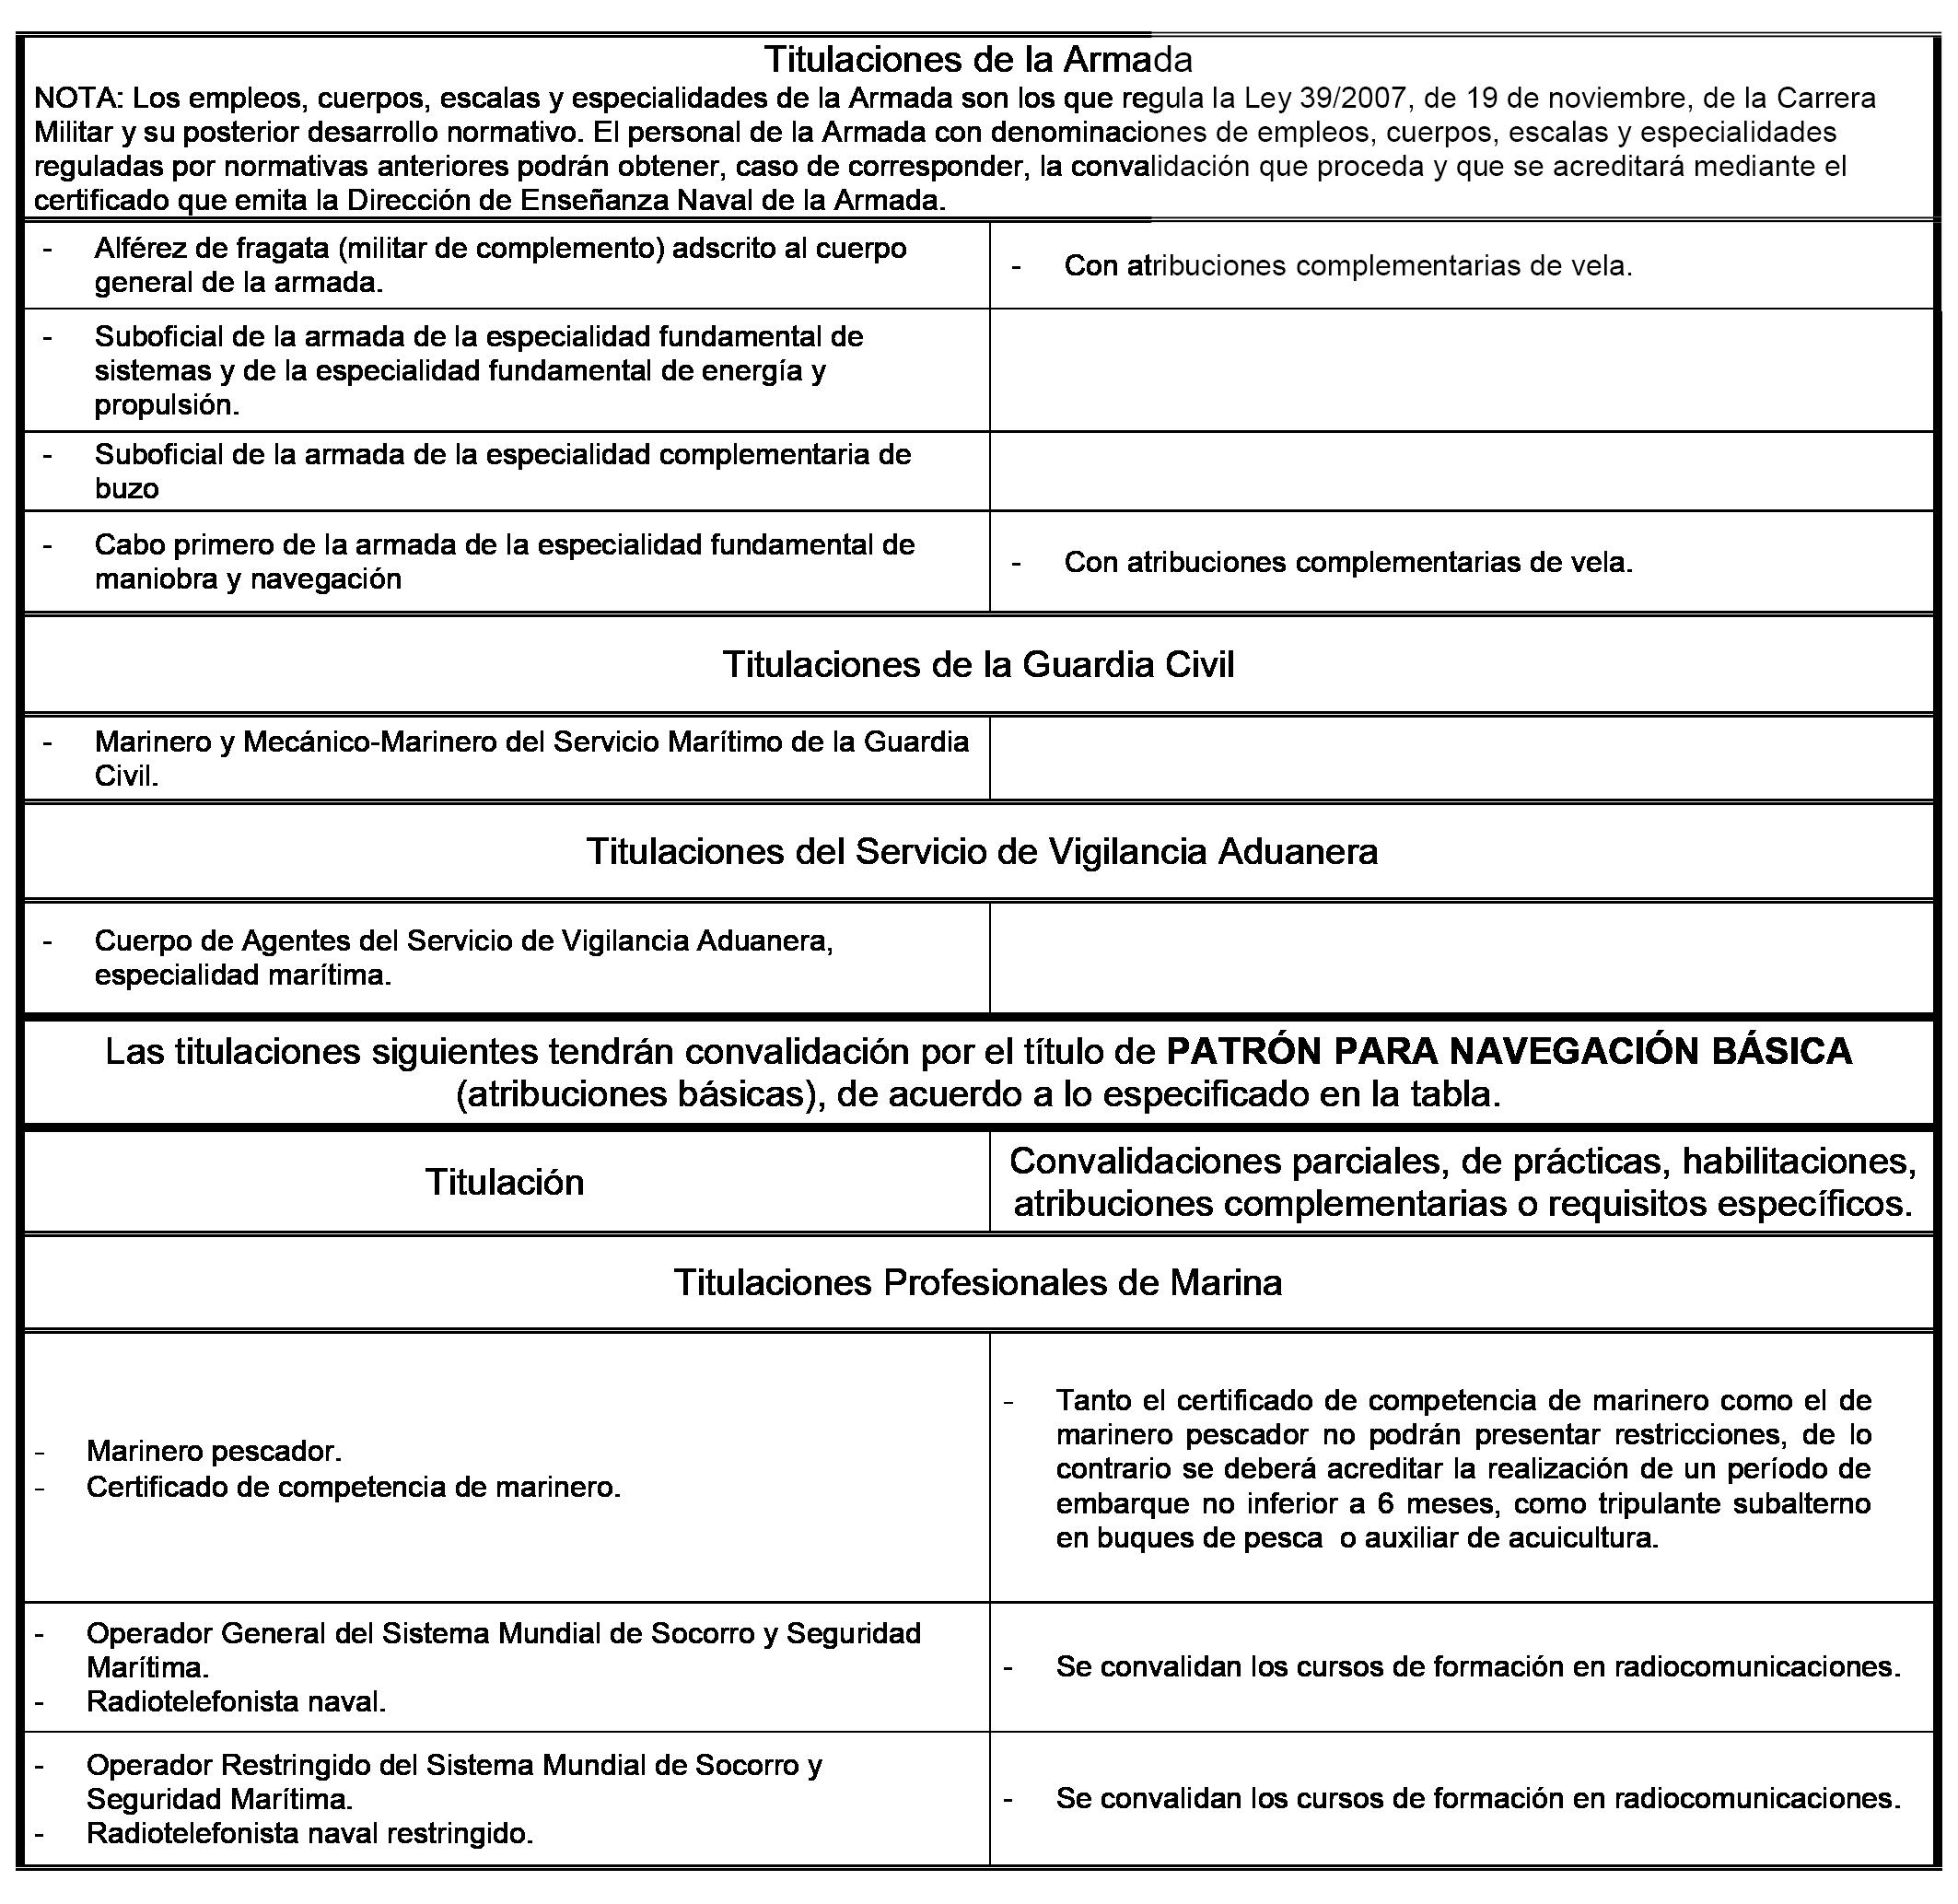 BOE.es - Documento BOE-A-2014-10344